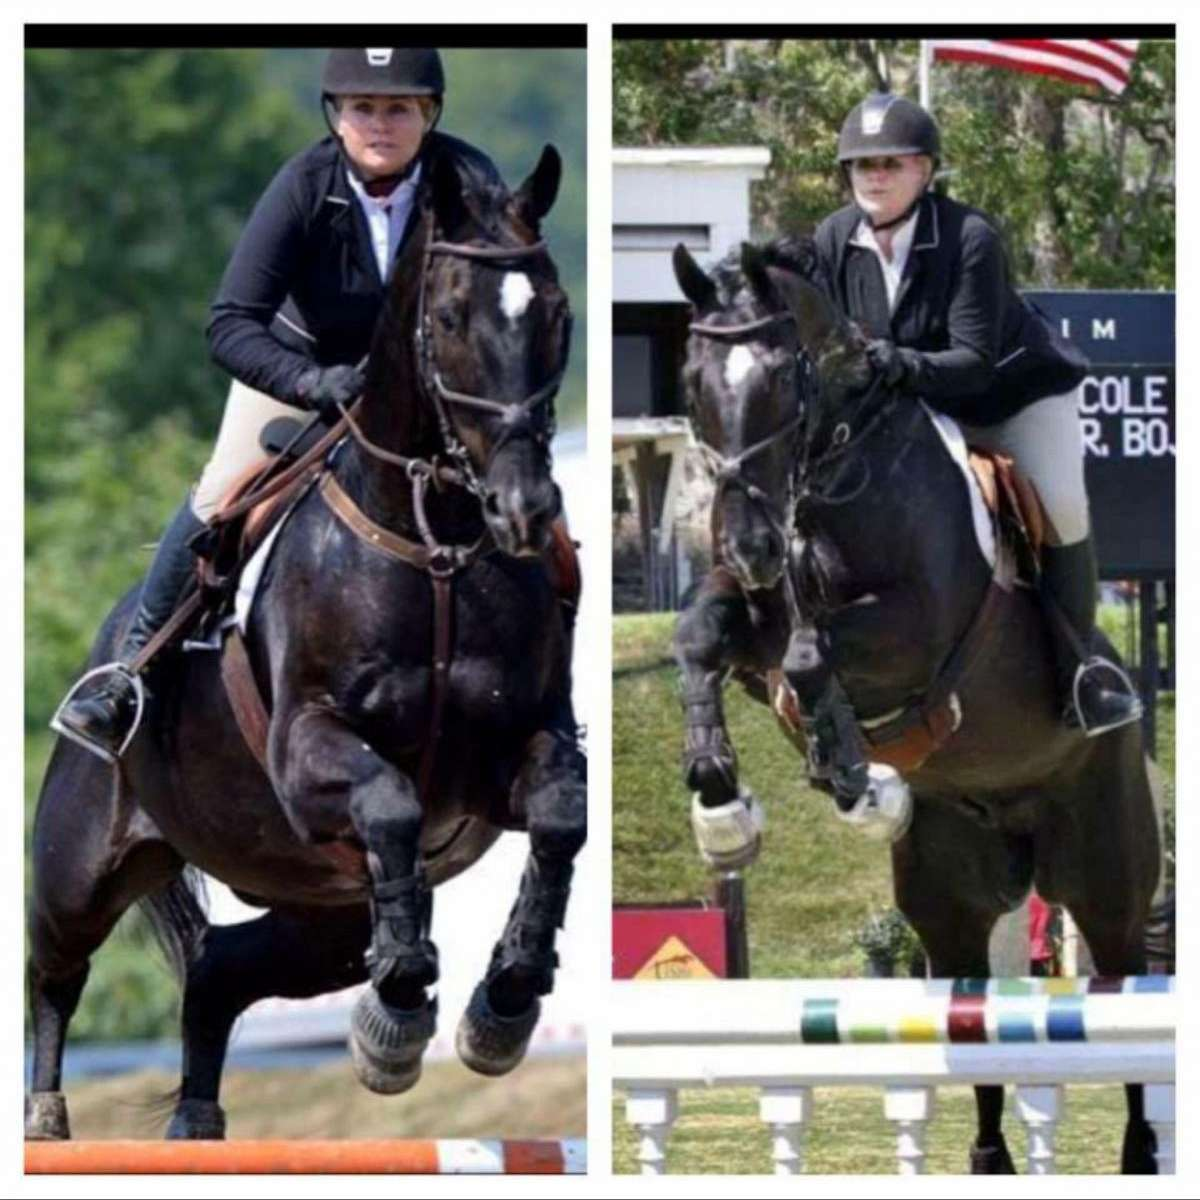 Global Equestrians Int. Riding School LLC